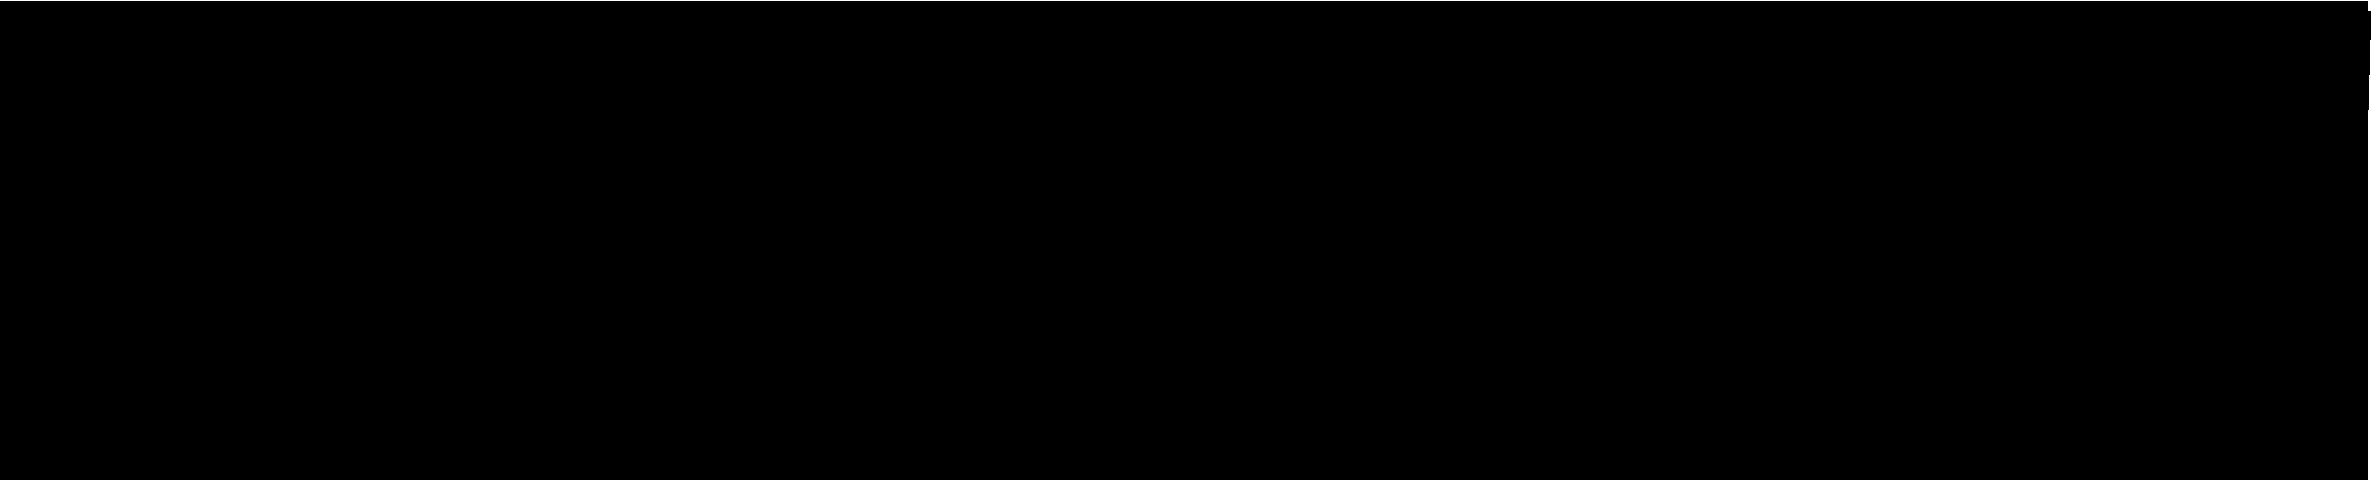 katancha logo